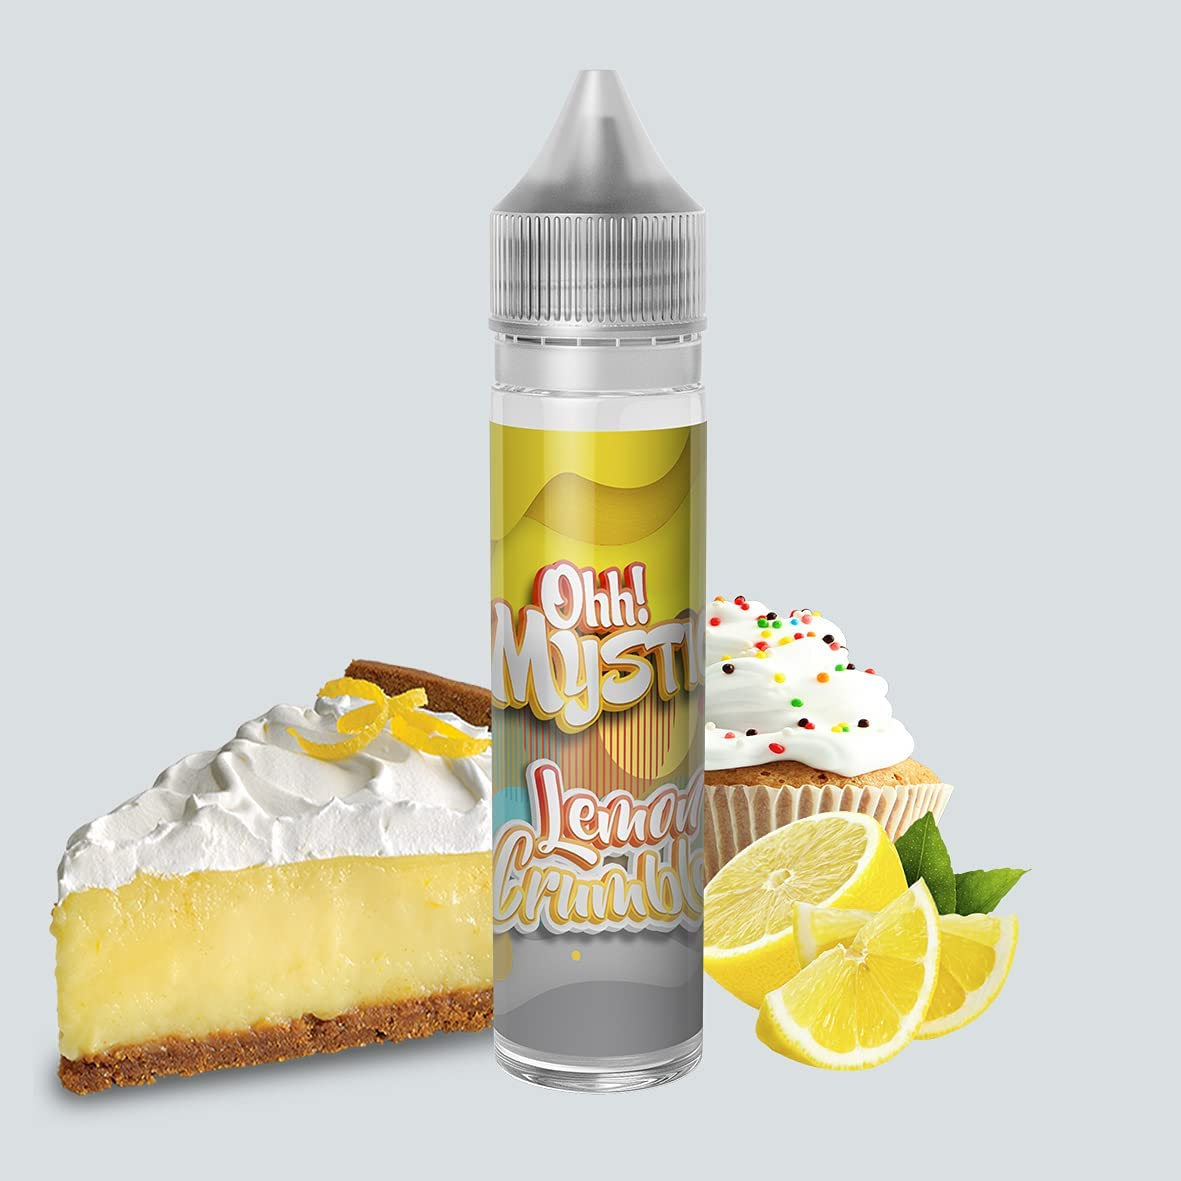 Ohh! Mystic Lemon Crumble 50ML TPD - E-Liquid - Sin Nicotina - 60ml formato TPD - 0MG Nicotina - E-Liquido para Cigarrillos Electronicos - E Liquidos para Vaper…